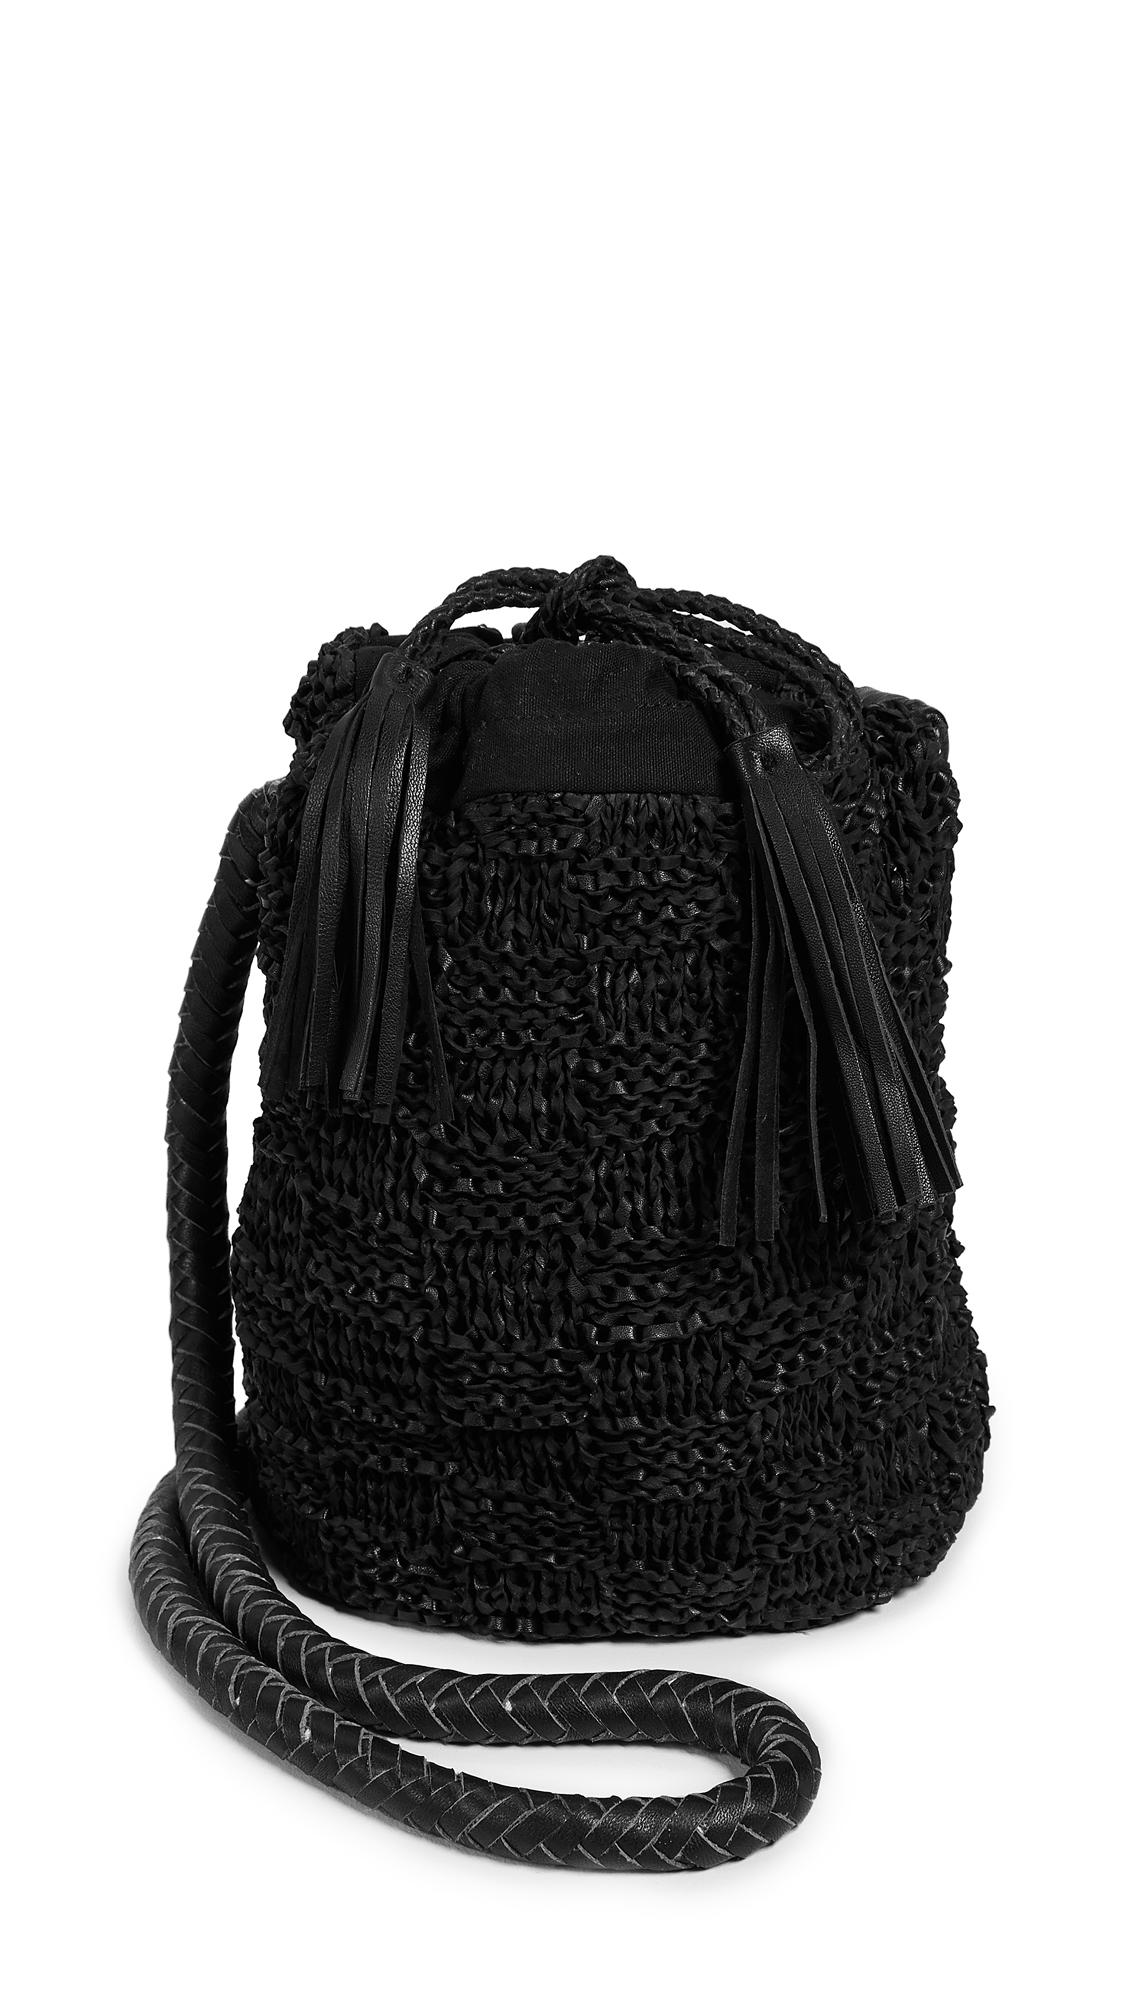 SOPHIE ANDERSON ADIA SMALL BUCKET BAG